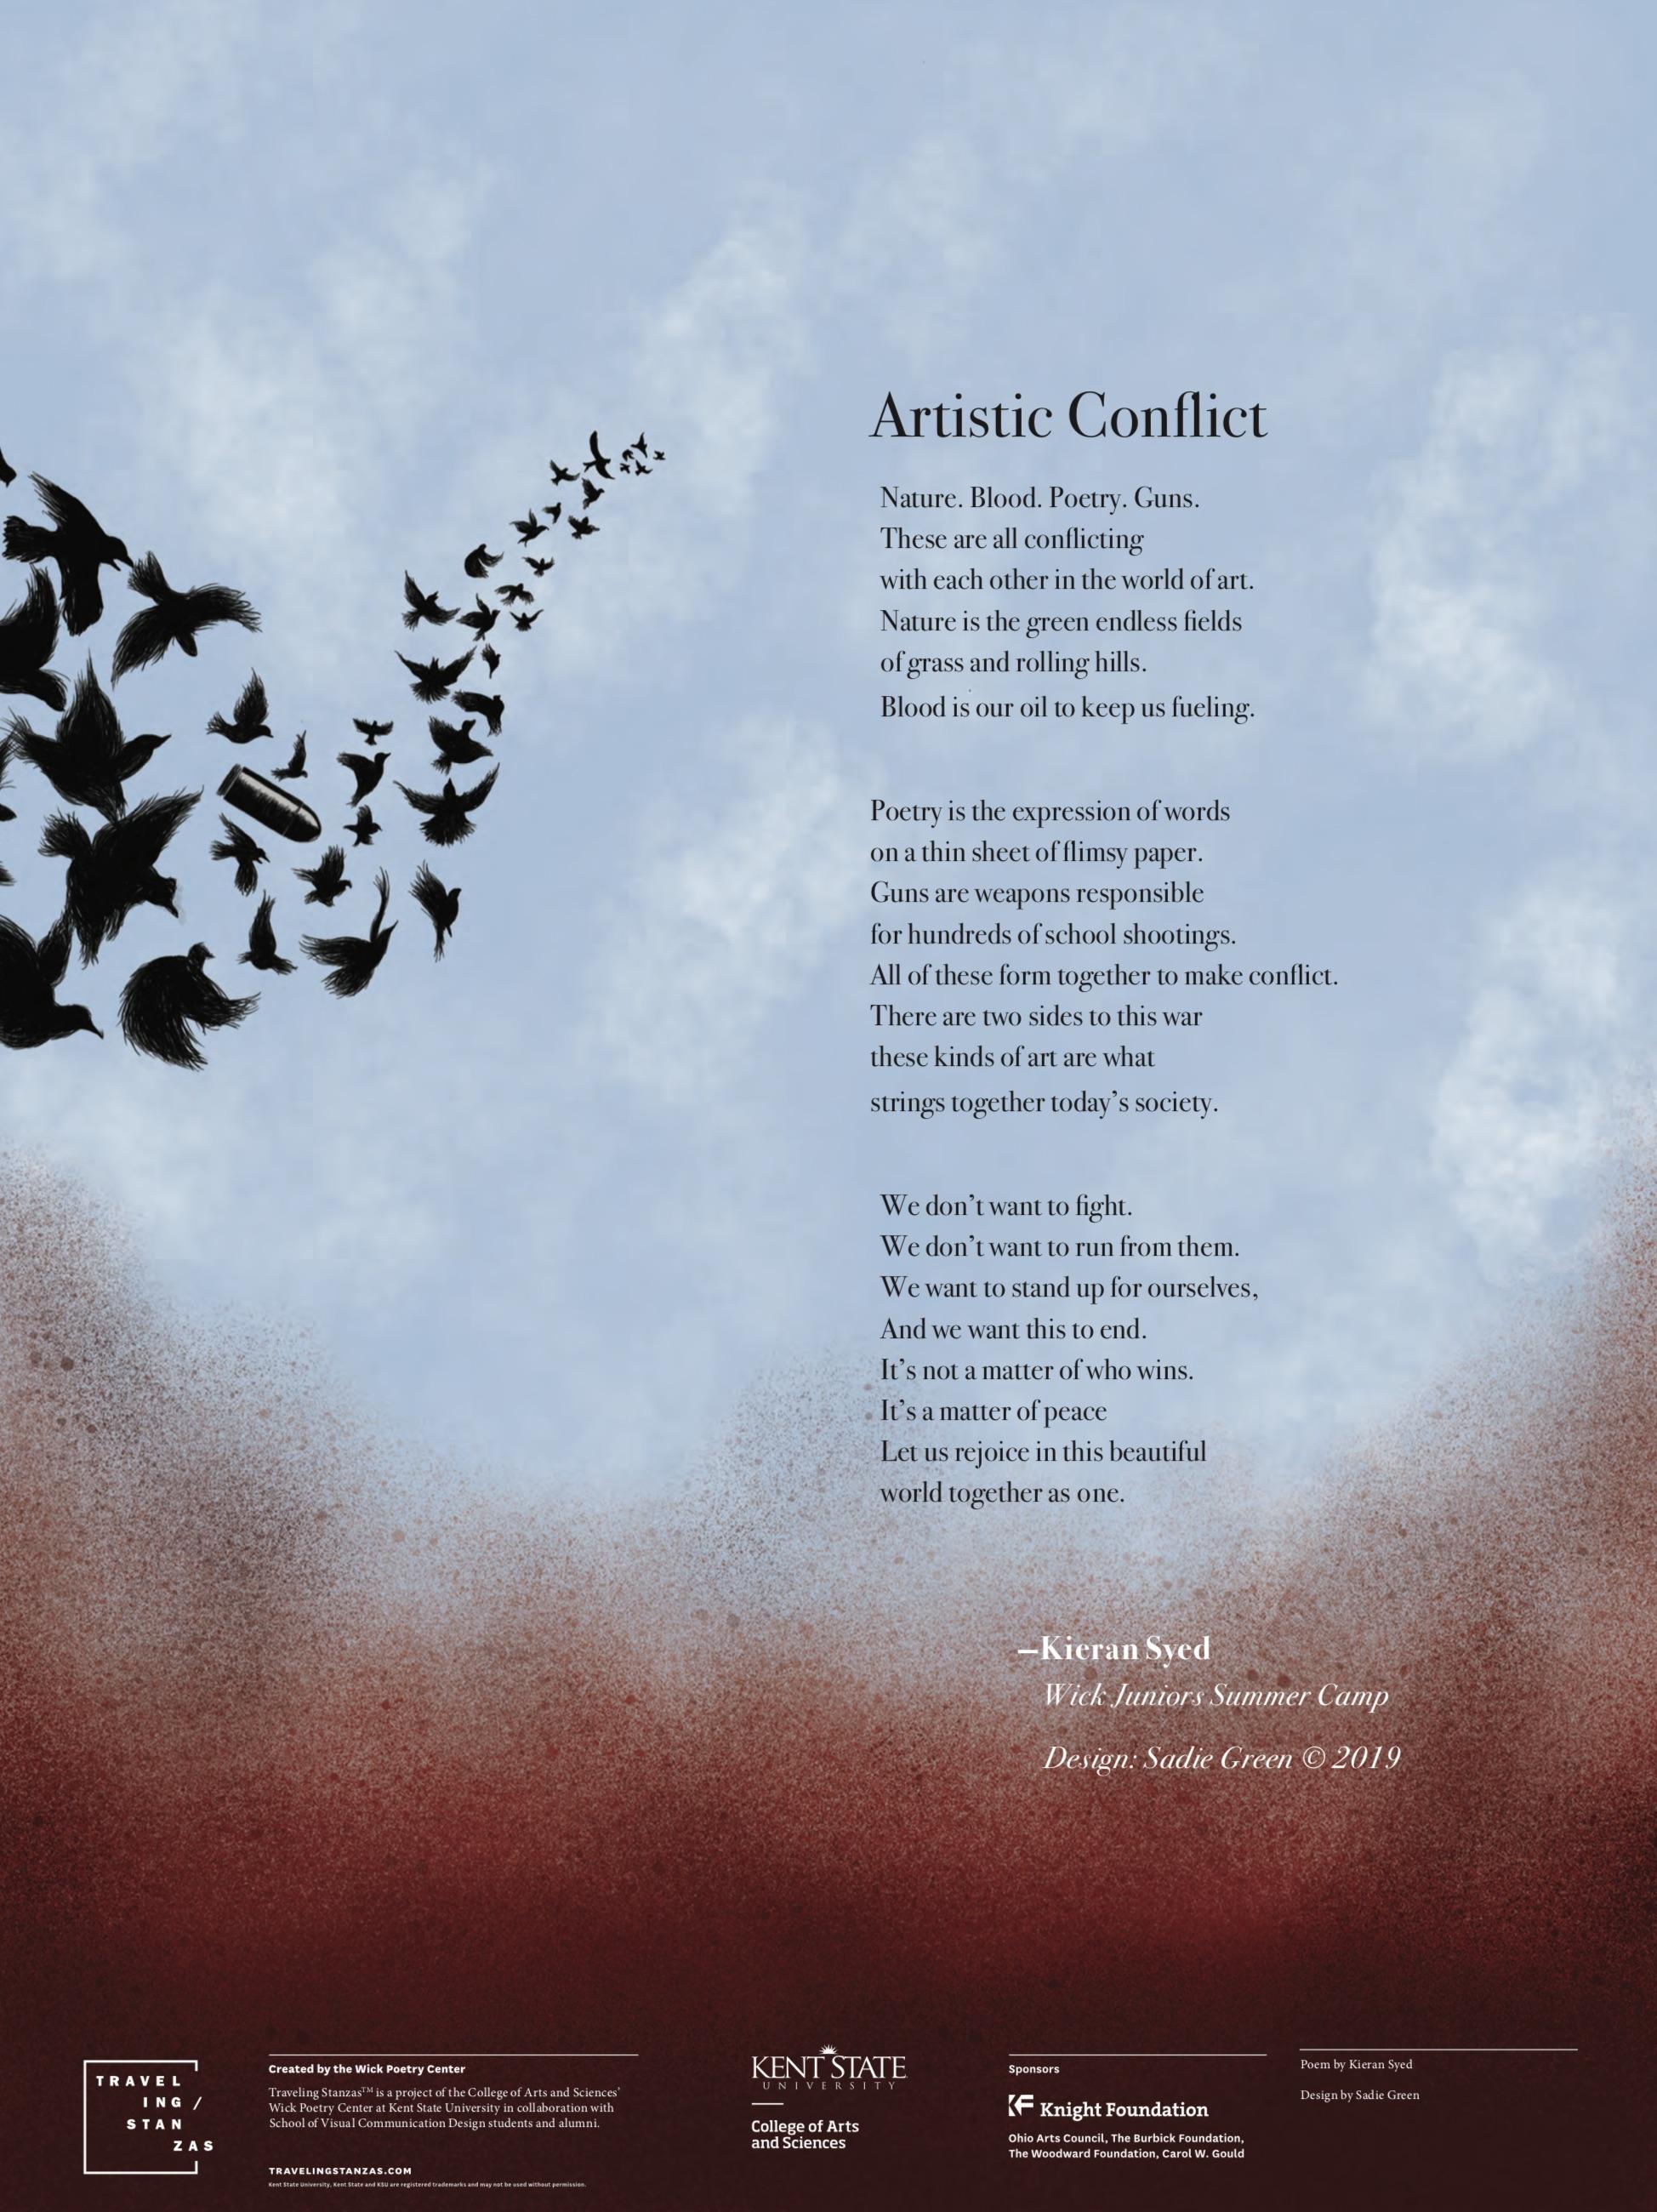 Artistic Conflict